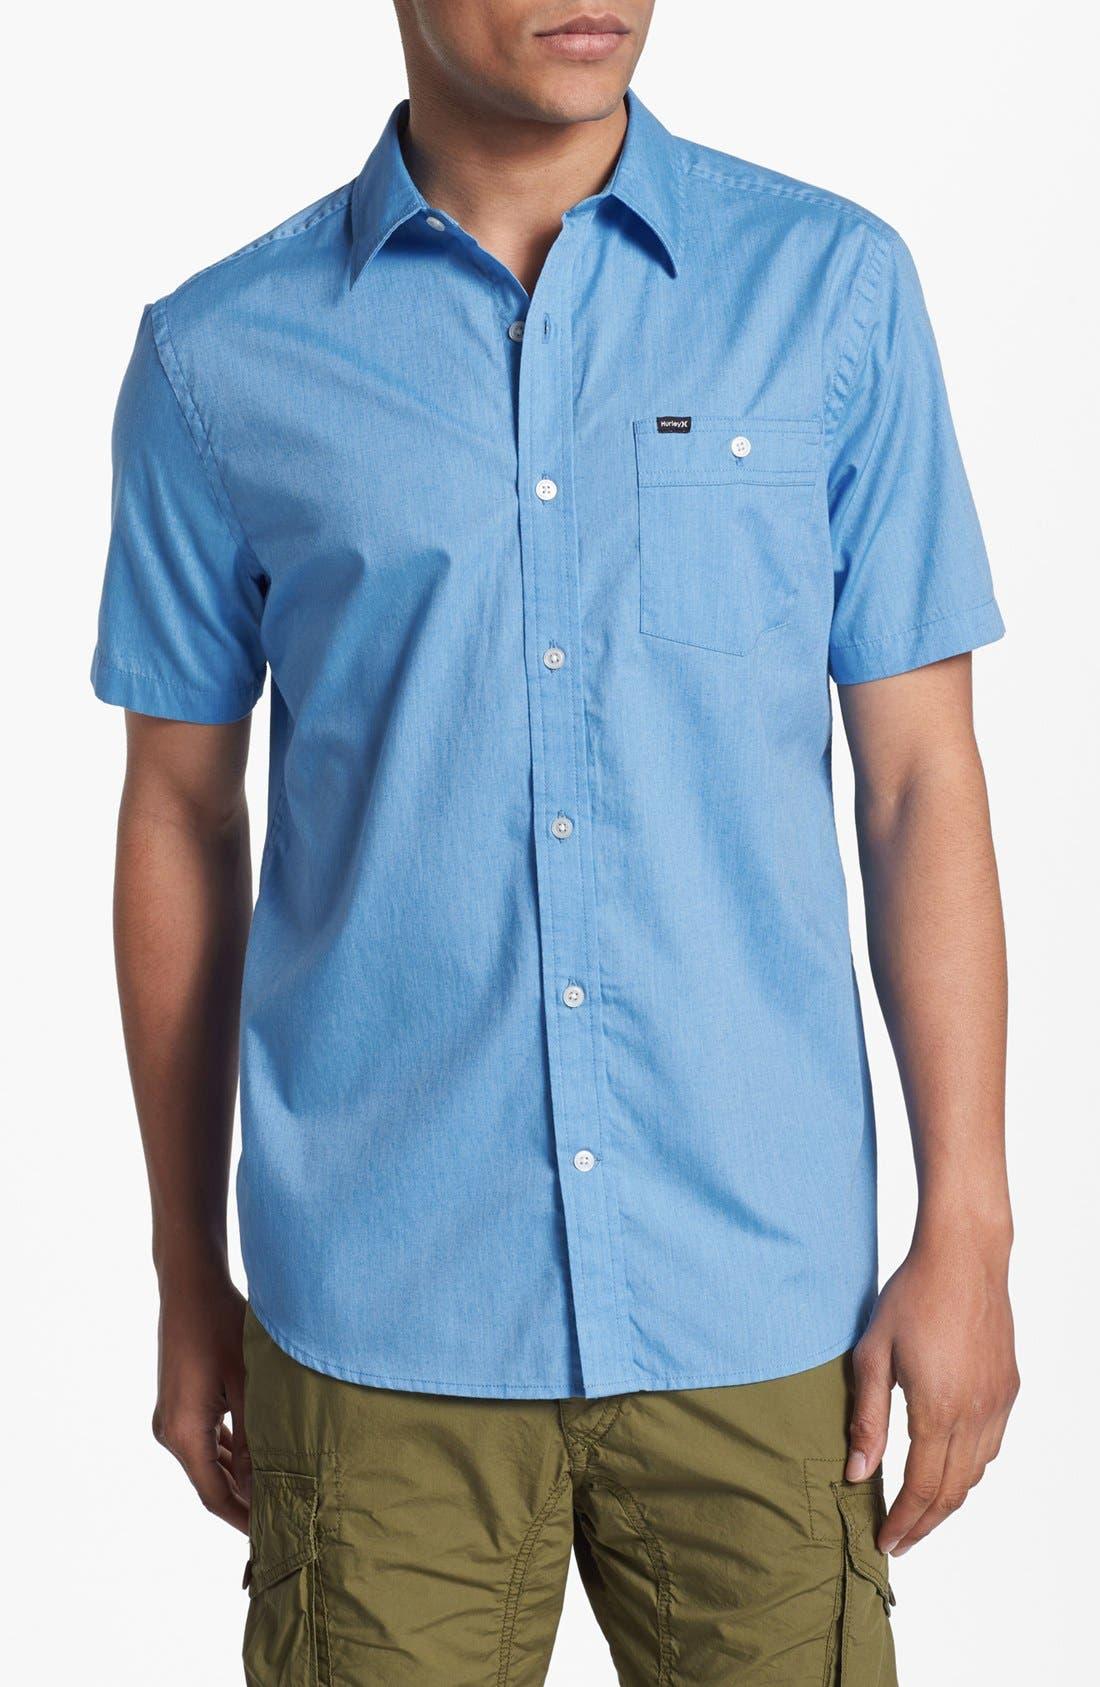 Main Image - Hurley 'Rise' Woven Shirt